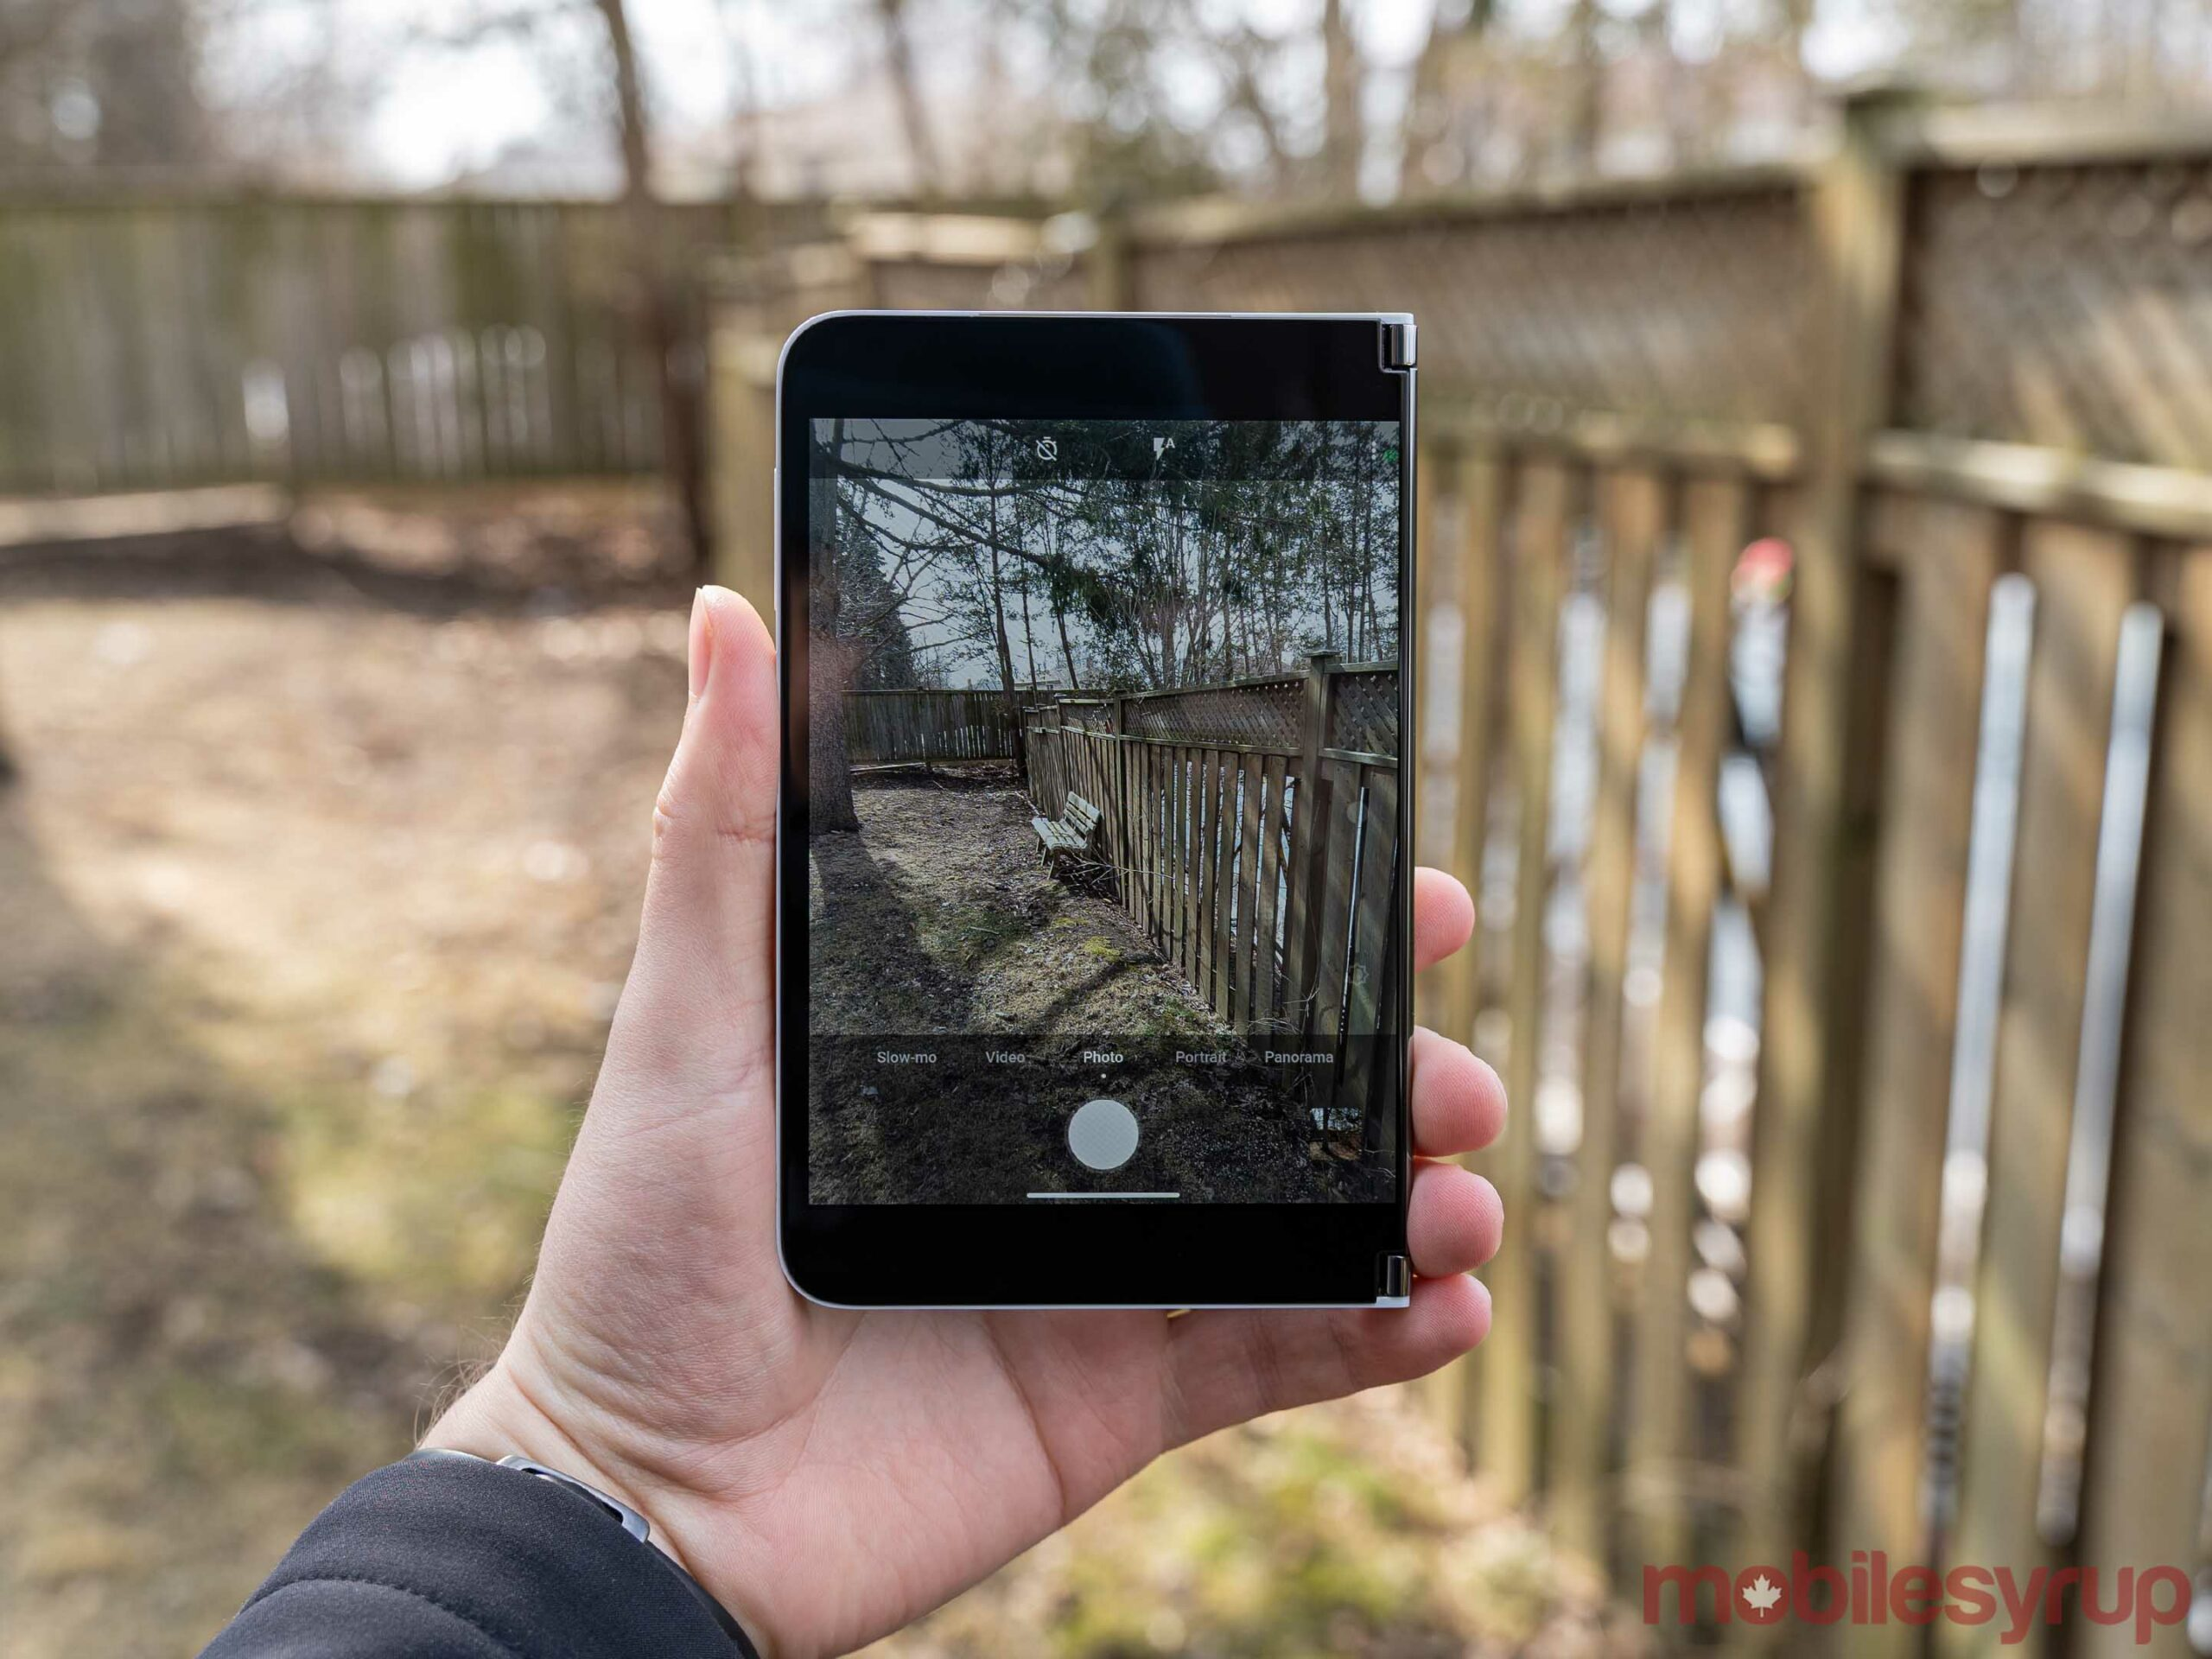 Surface Duo camera app